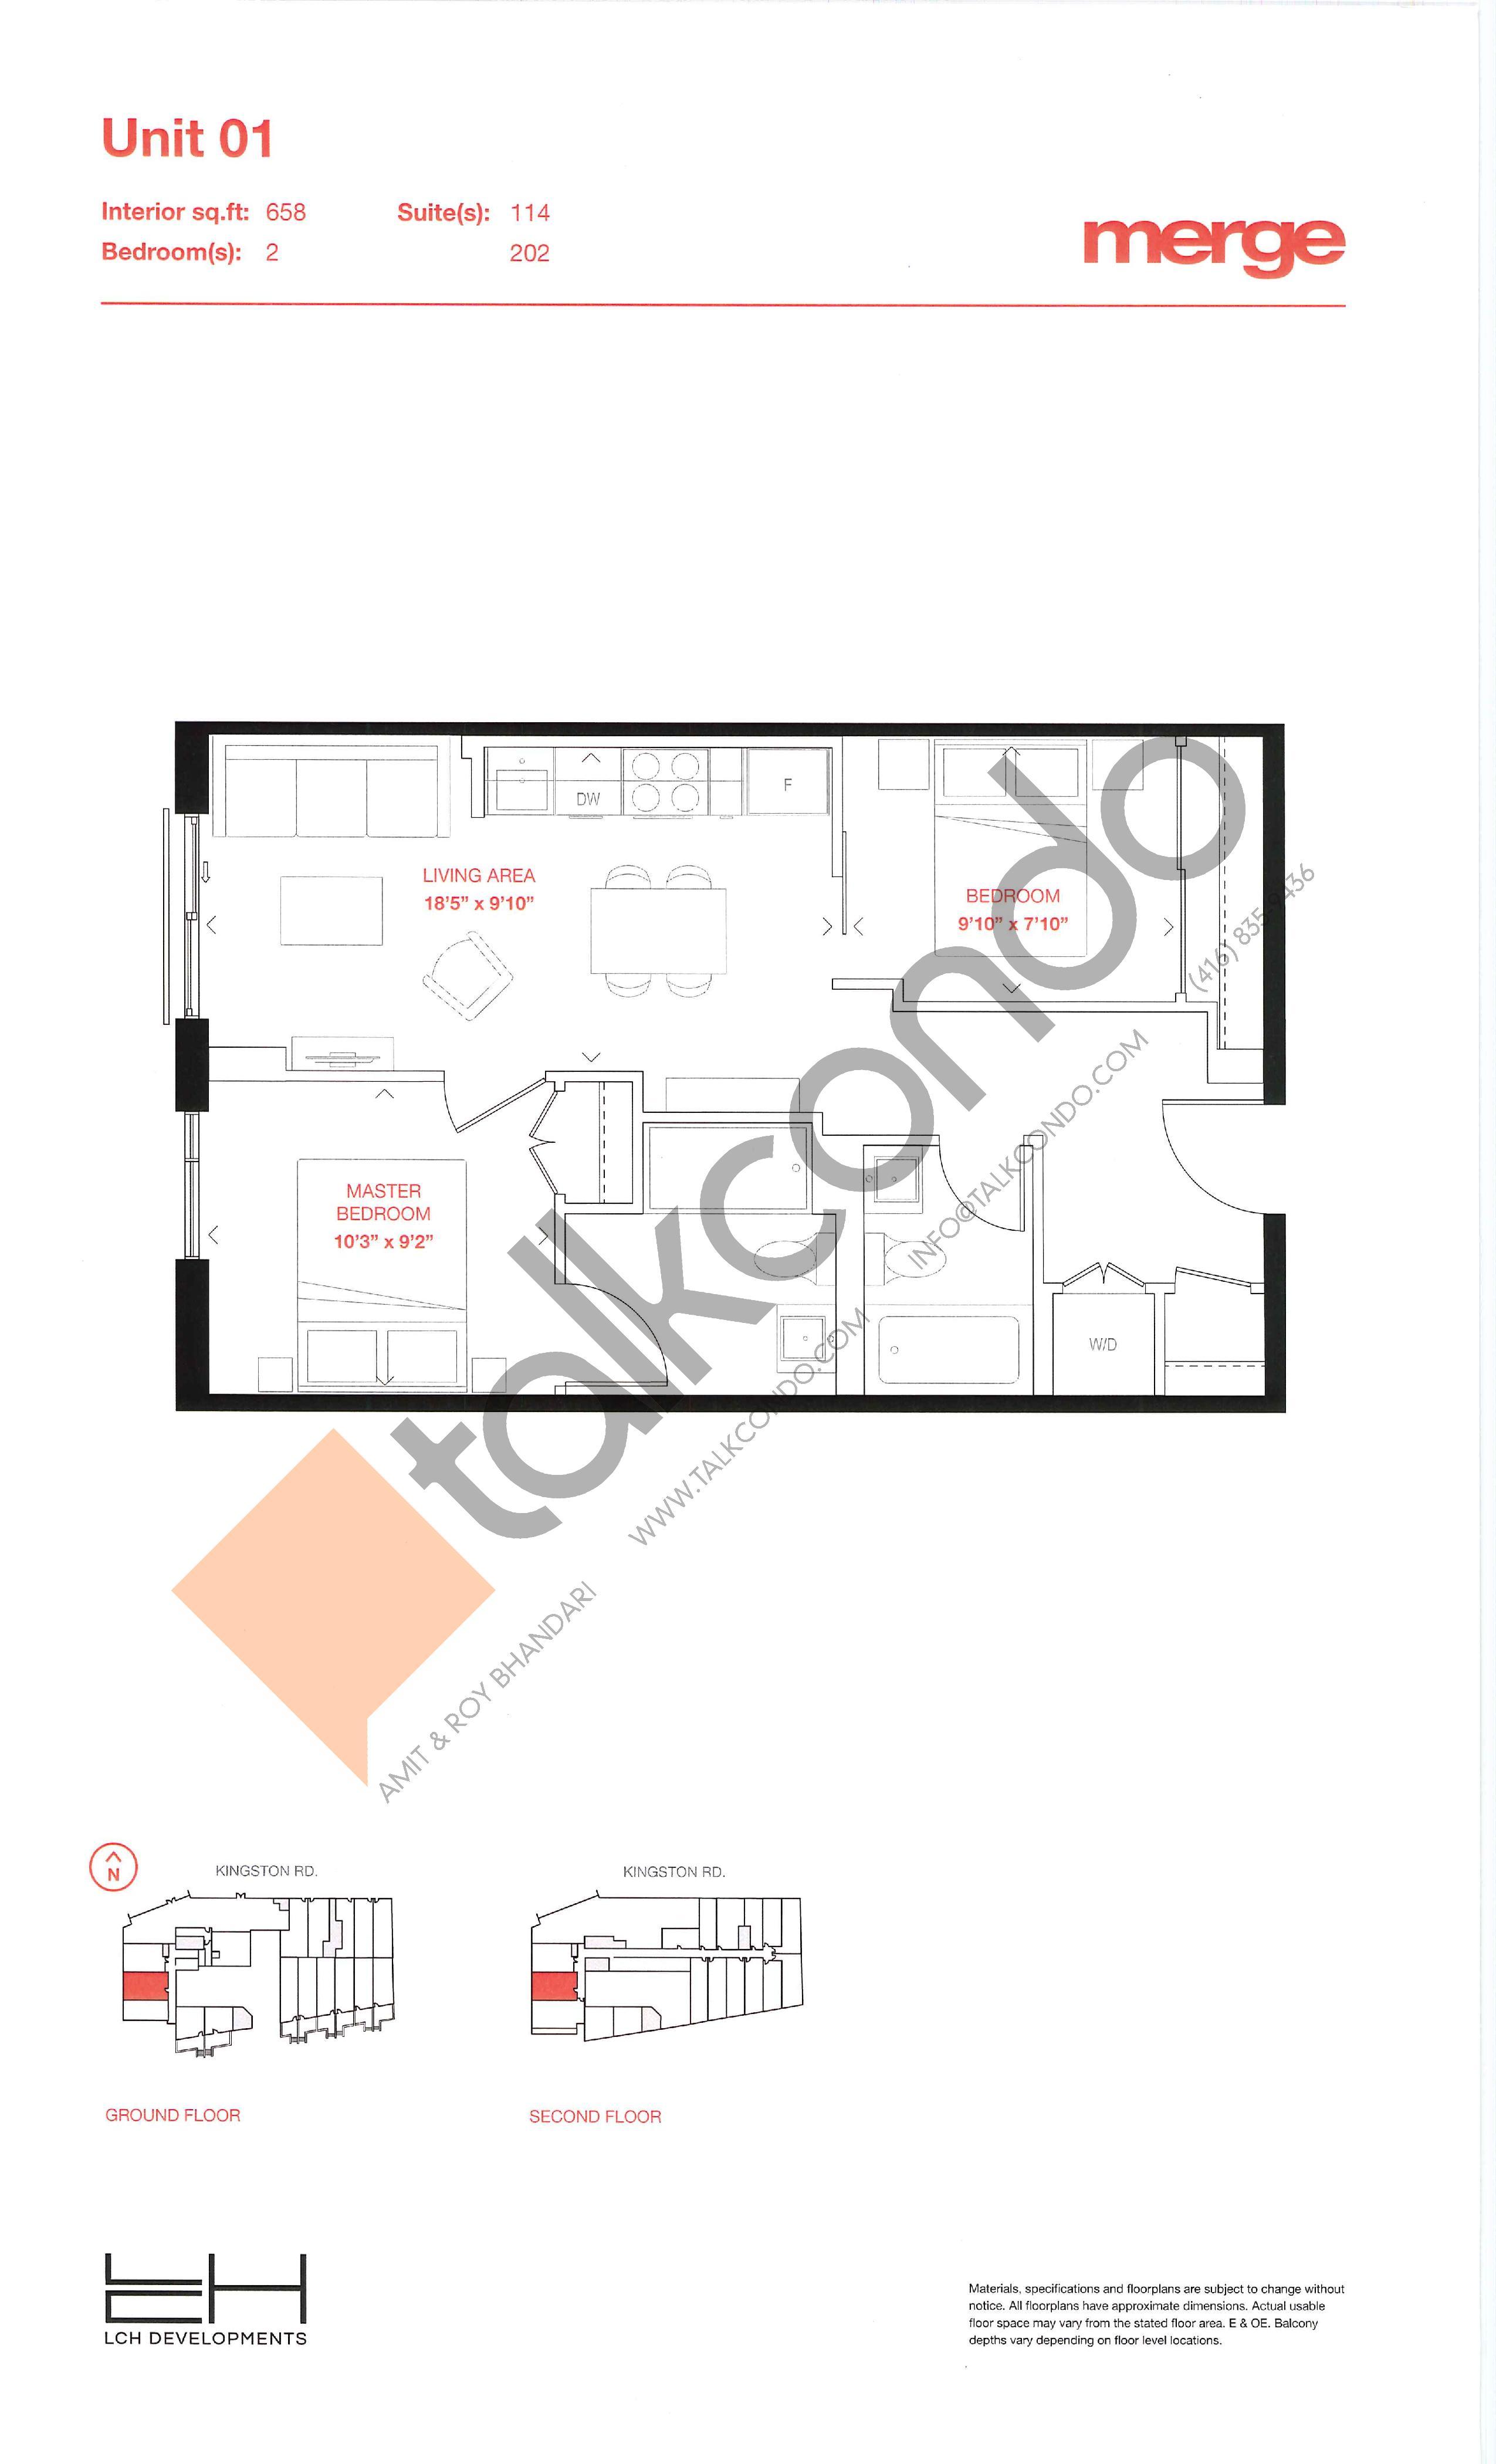 Unit 01 - Tower Floor Plan at Merge Condos - 658 sq.ft